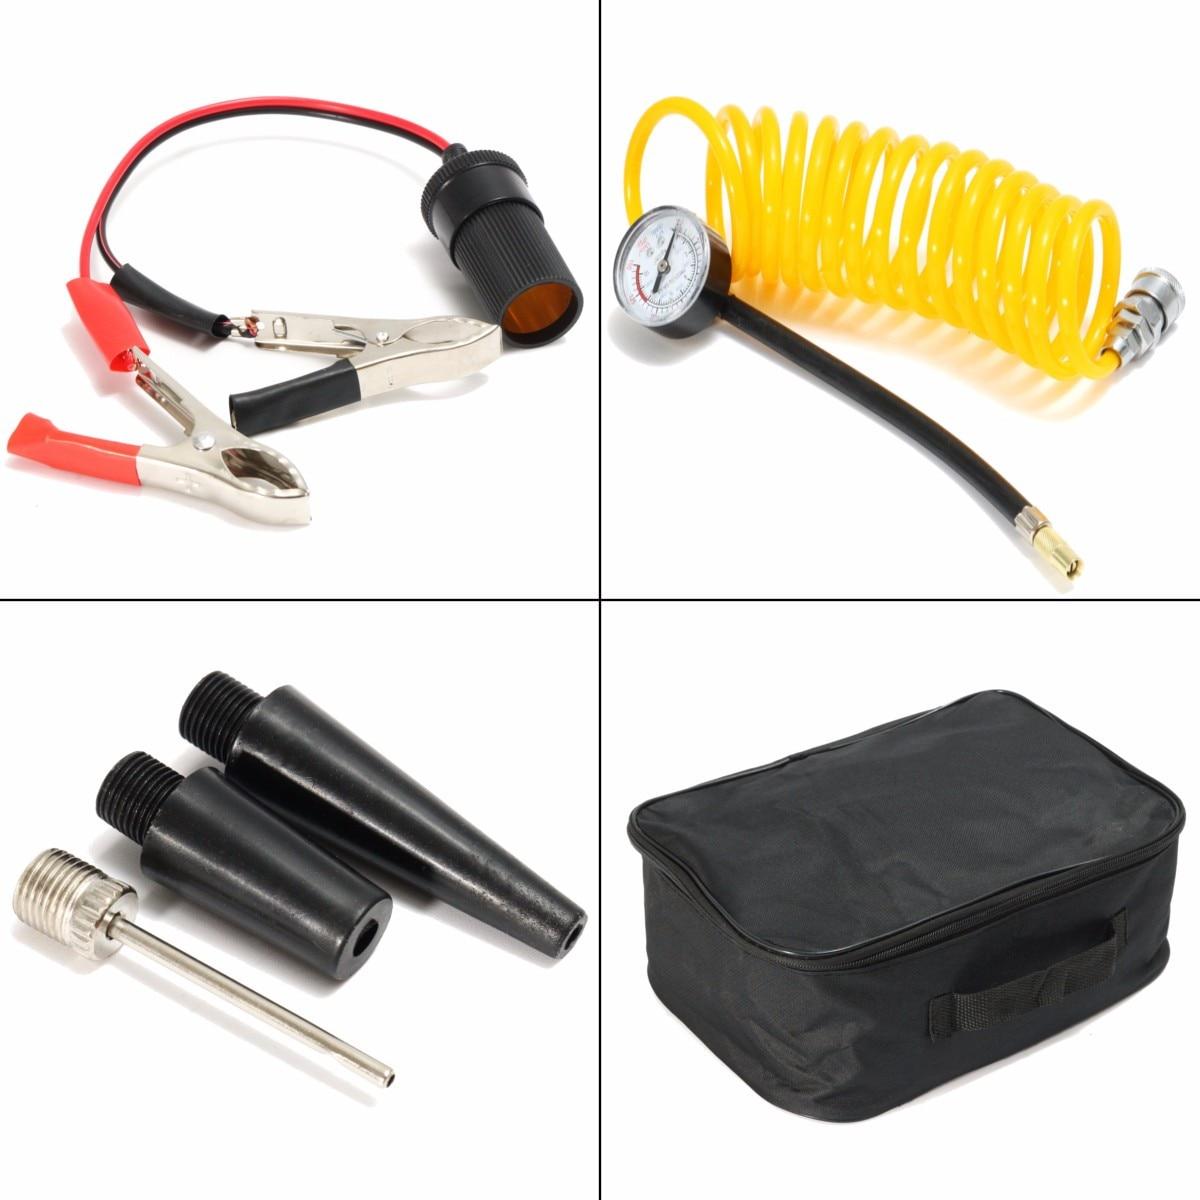 Wunderbar 30 Amp 220 Kabel Ideen - Elektrische Schaltplan-Ideen ...